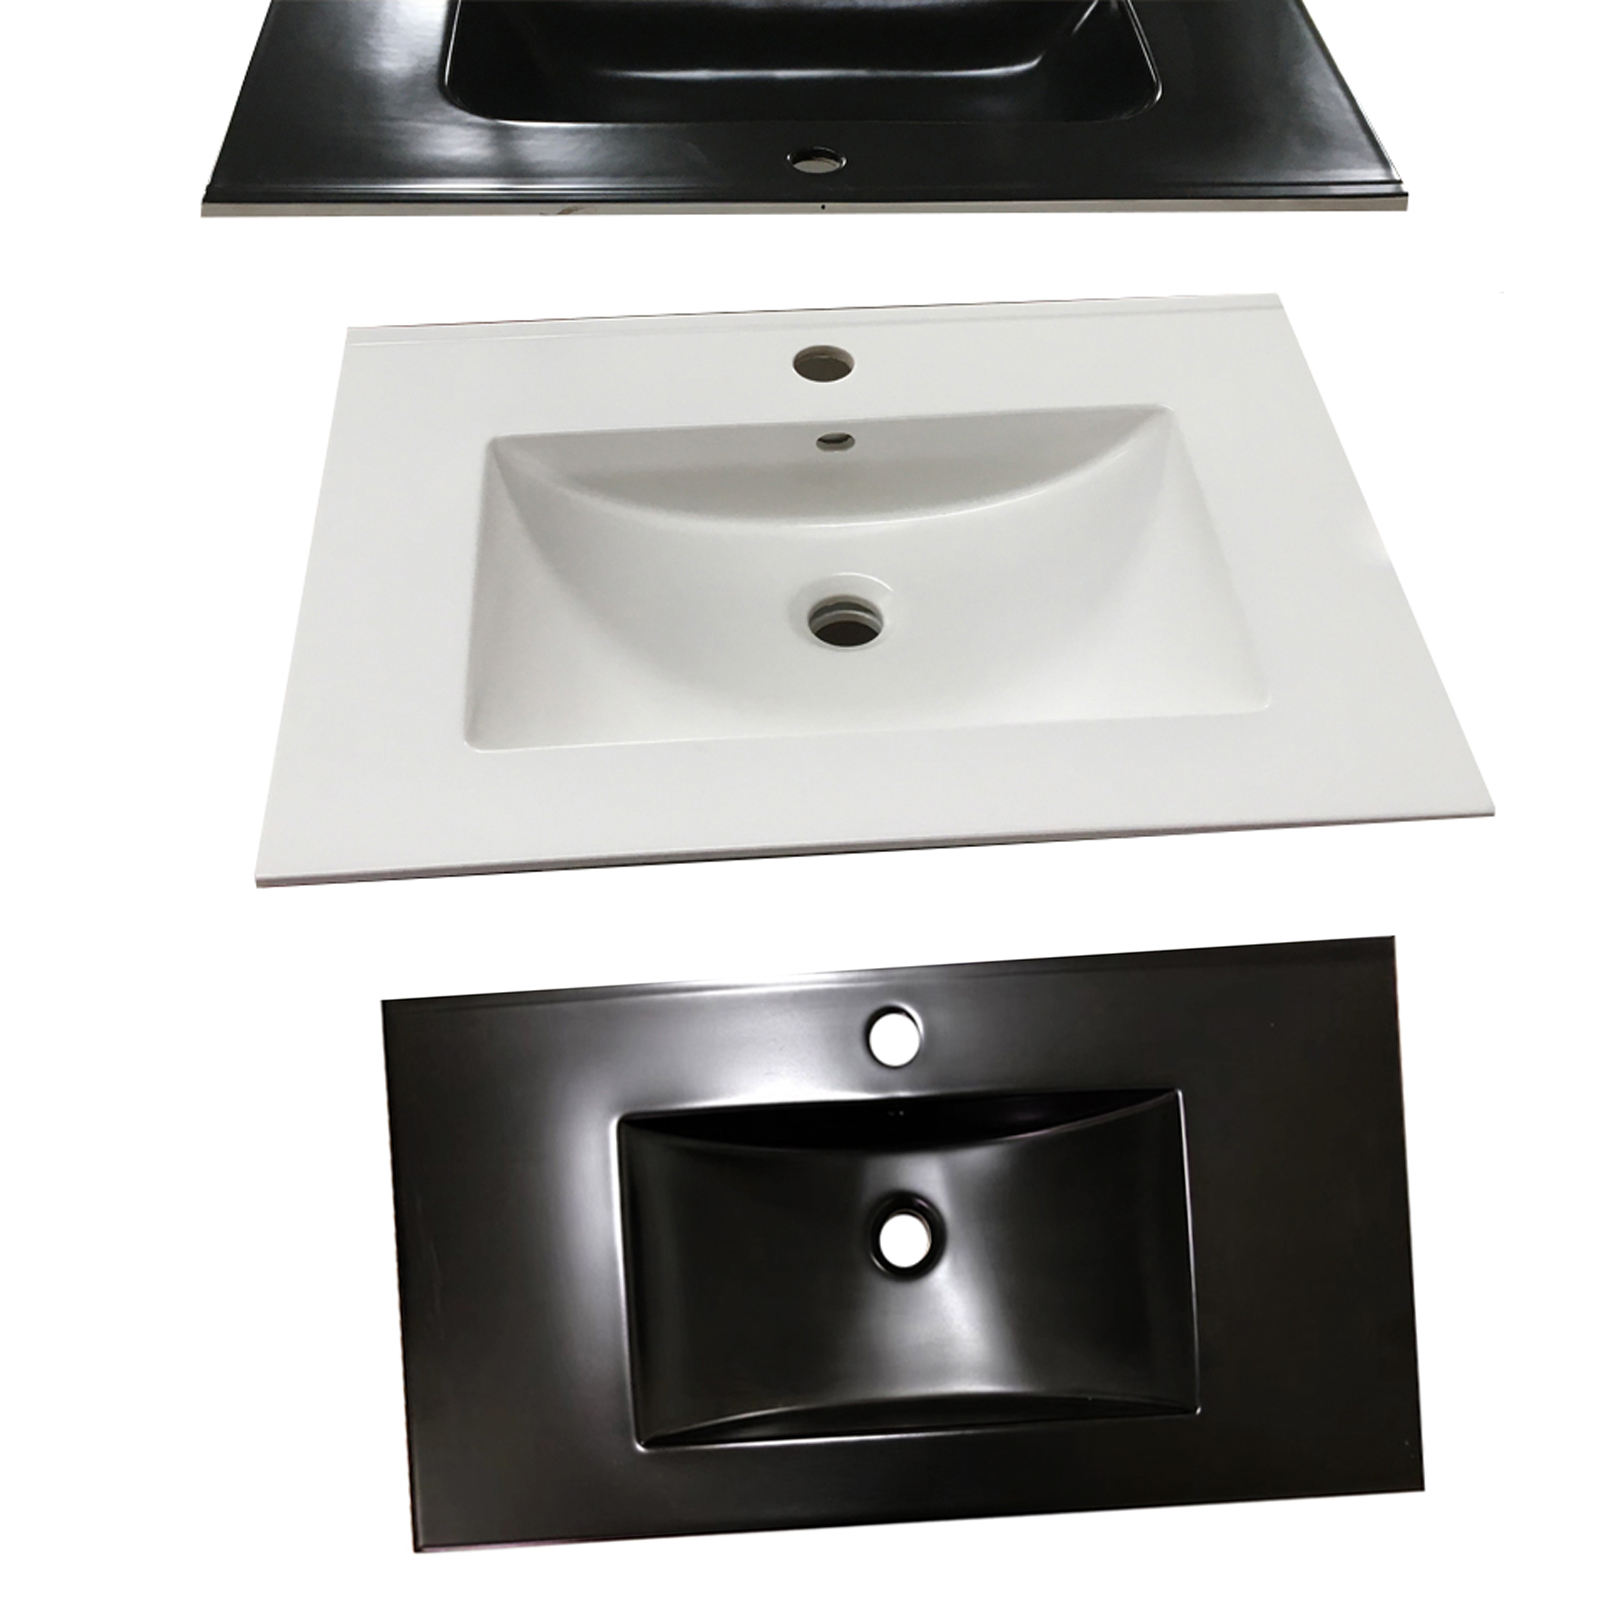 Bathroom Sinks Black Mat Vessel Sink Sanitary Vanity Top Drop Vasque Lavabo Fired Mineral Finish Ceramic Top For Shelf Vanity Buy Bathroom Sinks Black Mat Vessel Sink Sanitary Vanity Top Drop